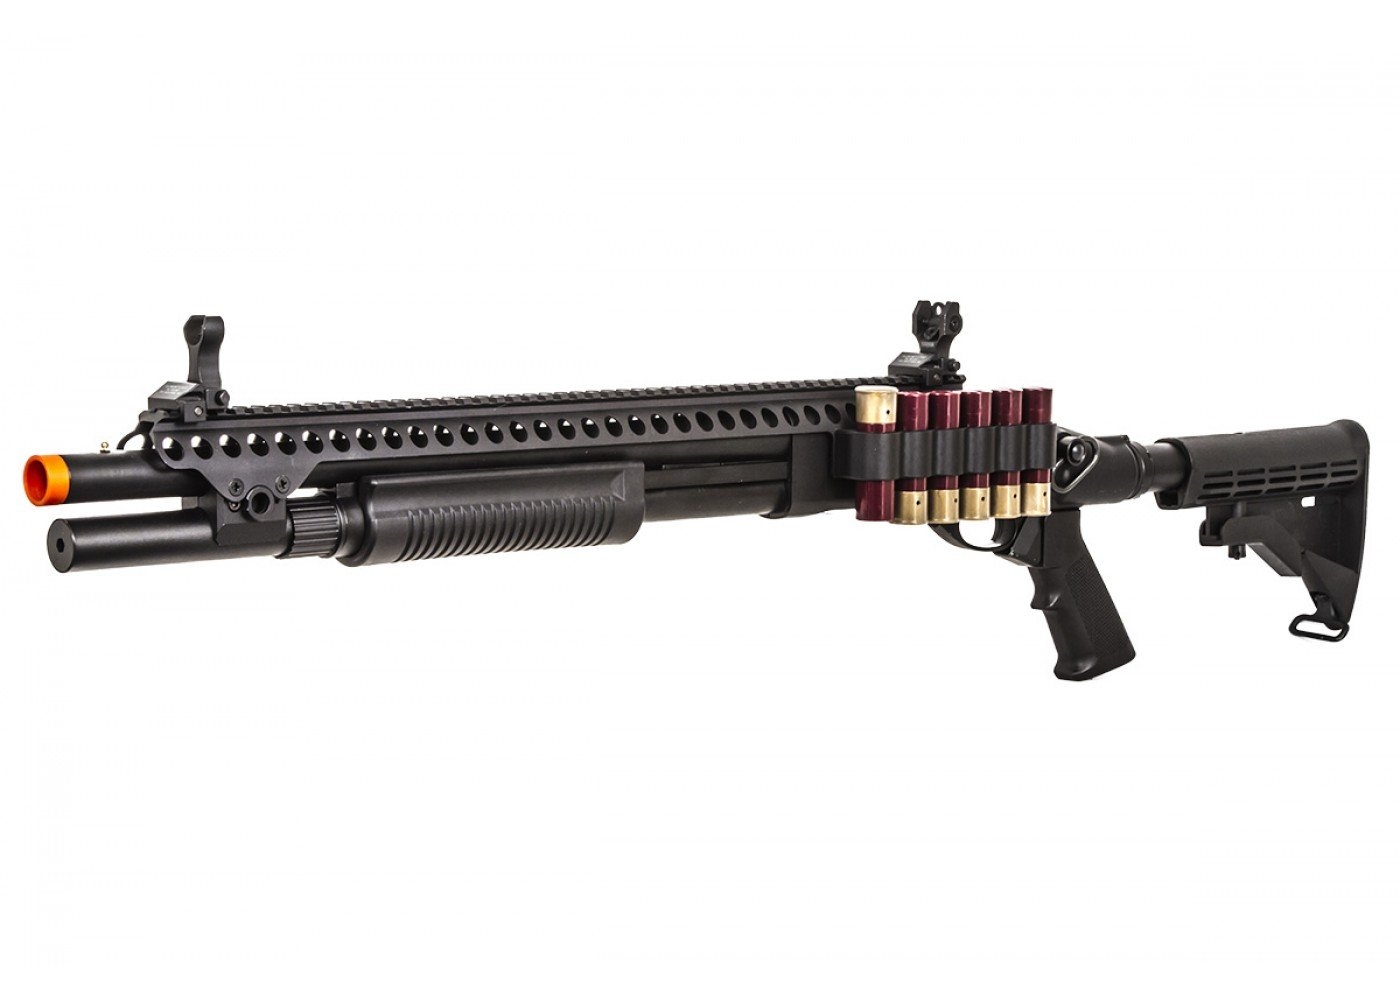 jag arms scattergun sp gas shotgun airsoft gun